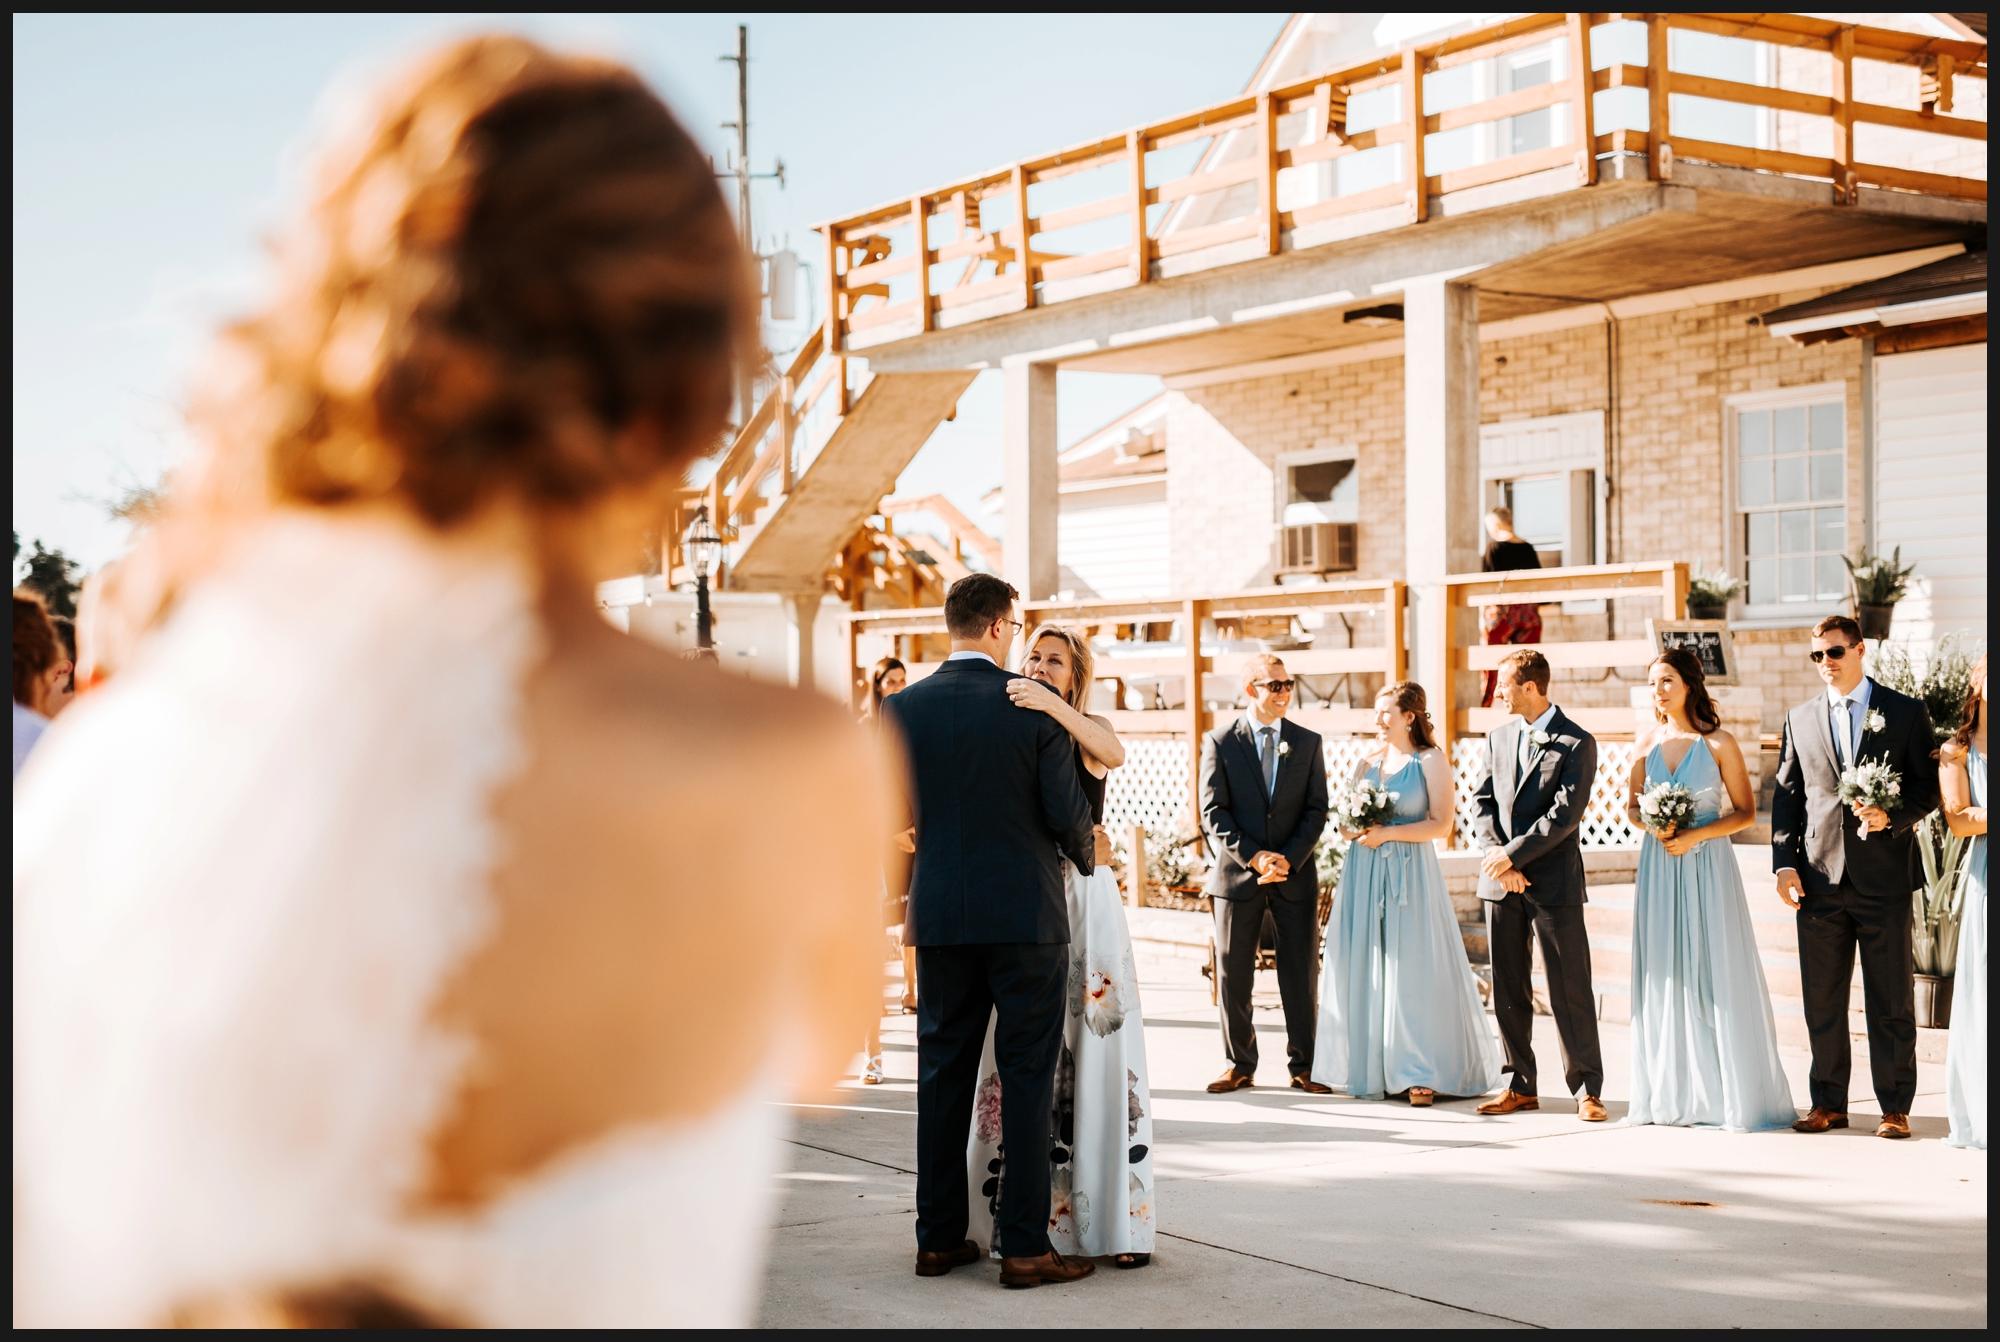 Orlando-Wedding-Photographer-destination-wedding-photographer-florida-wedding-photographer-bohemian-wedding-photographer_0105.jpg